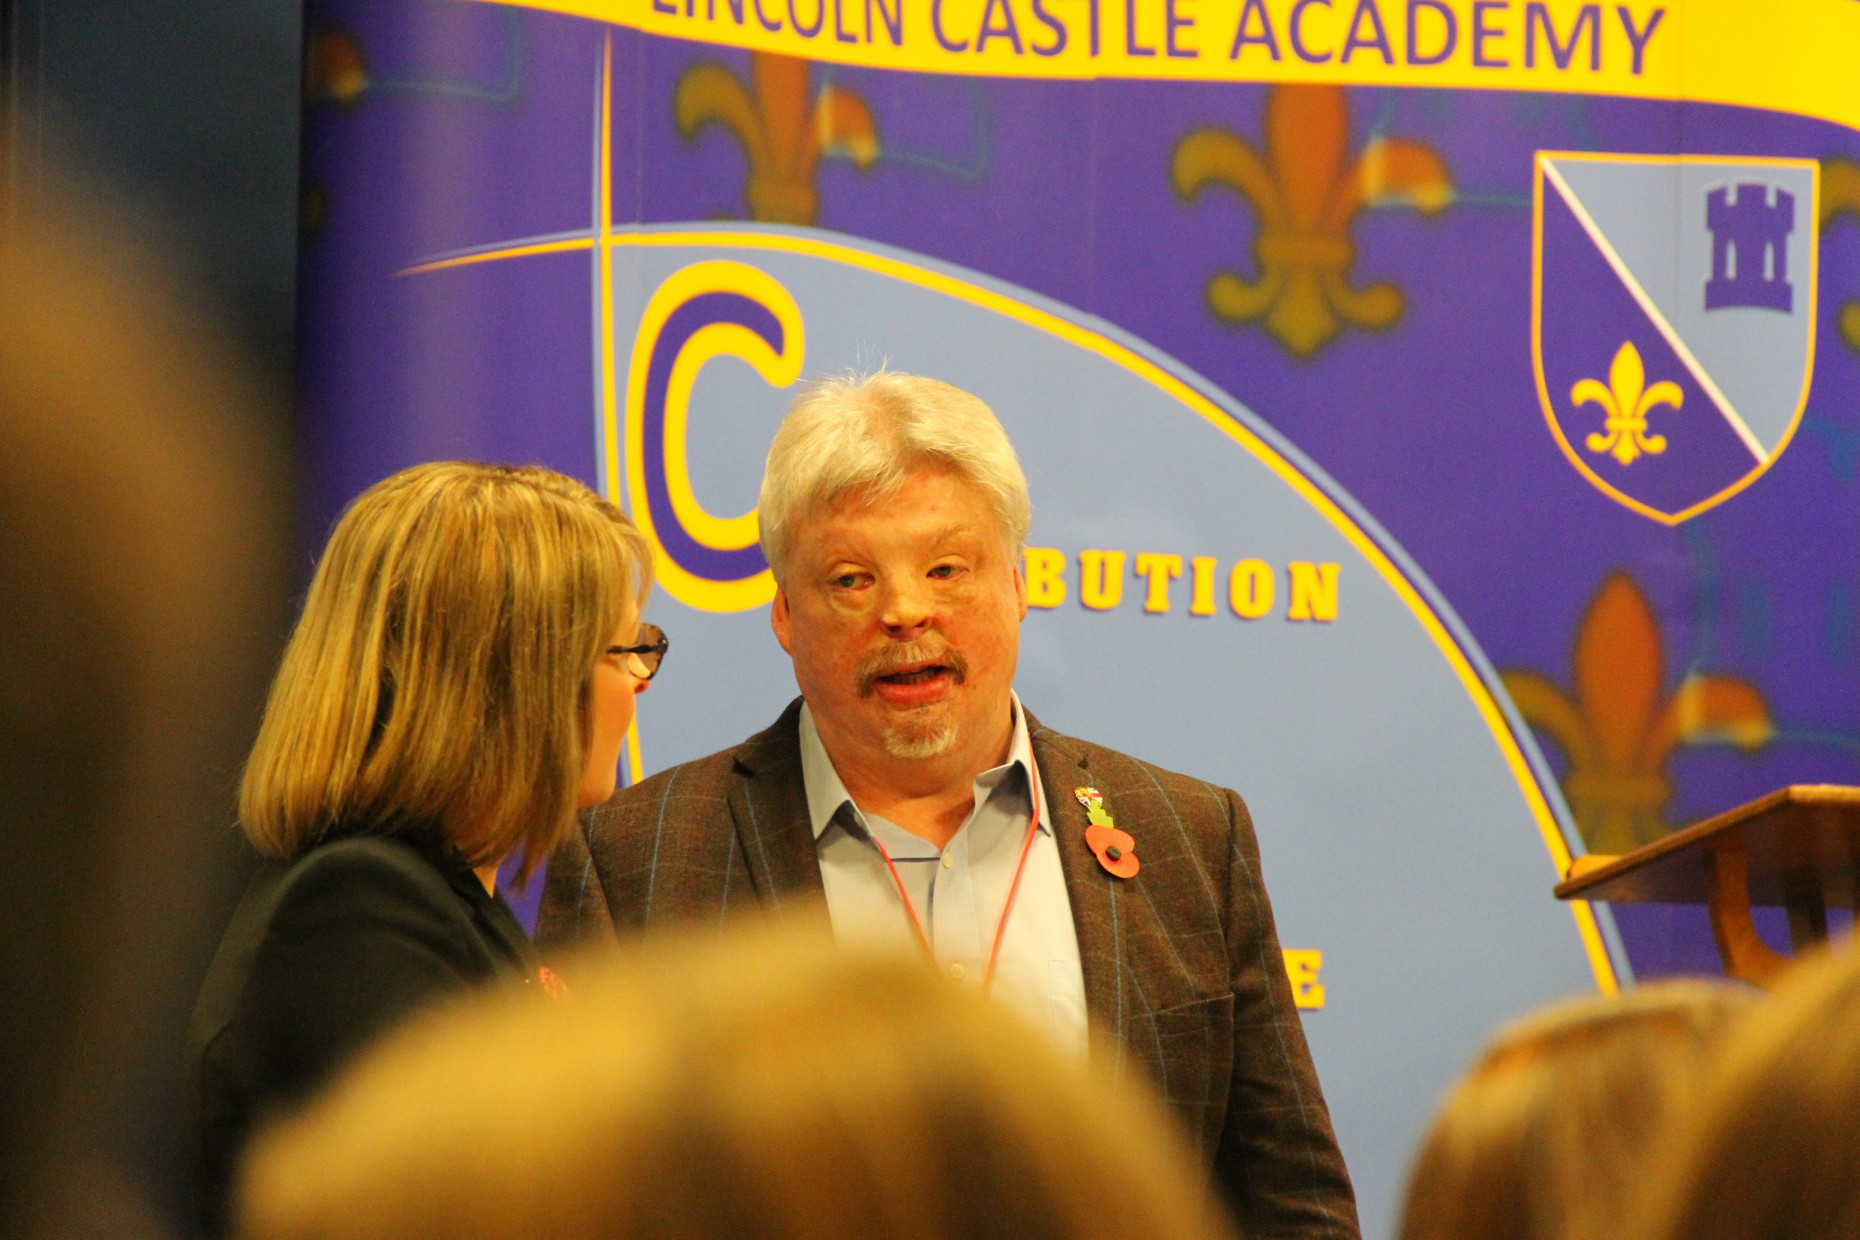 Simon Weston OBE. Photo: The Lincolnite